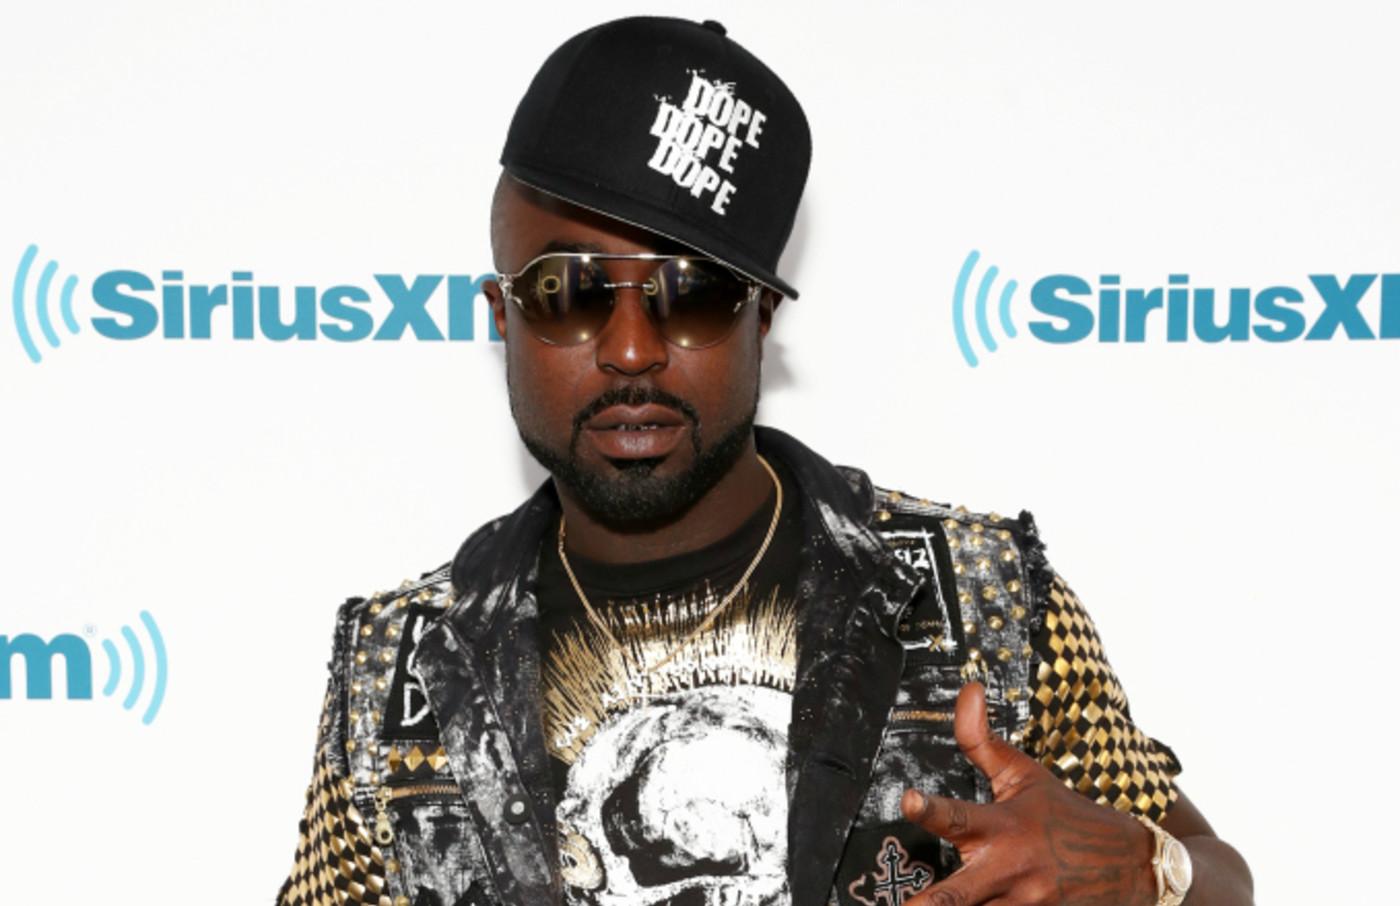 Rapper Young Buck visits the SiriusXM Studios